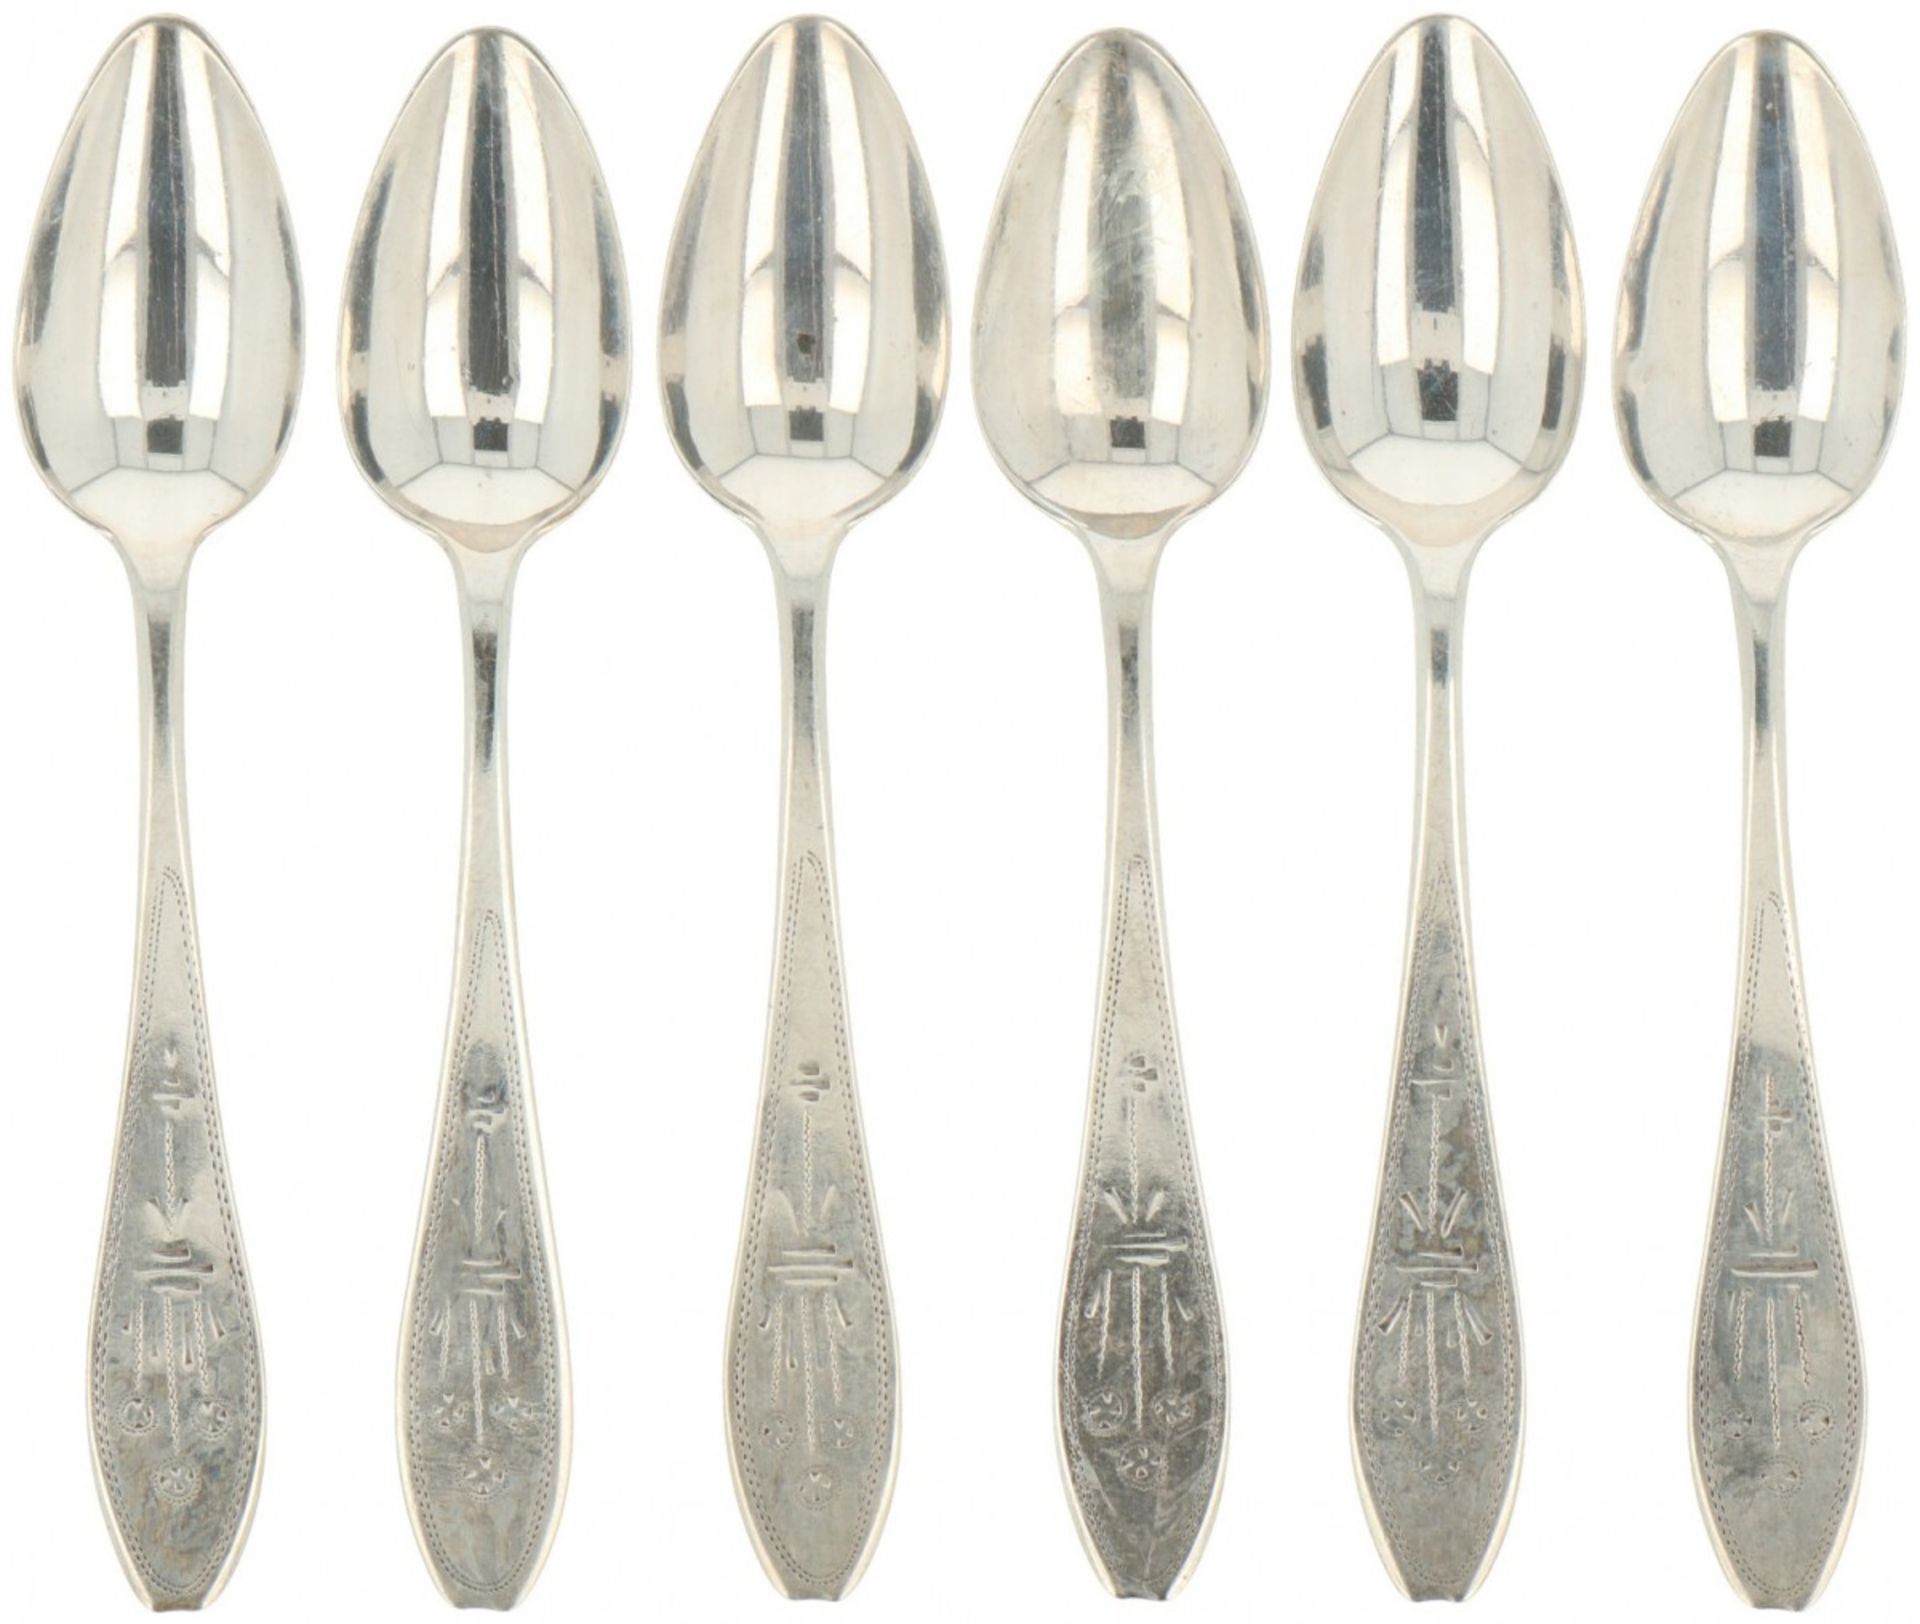 (6) piece set coffeespoons silver.